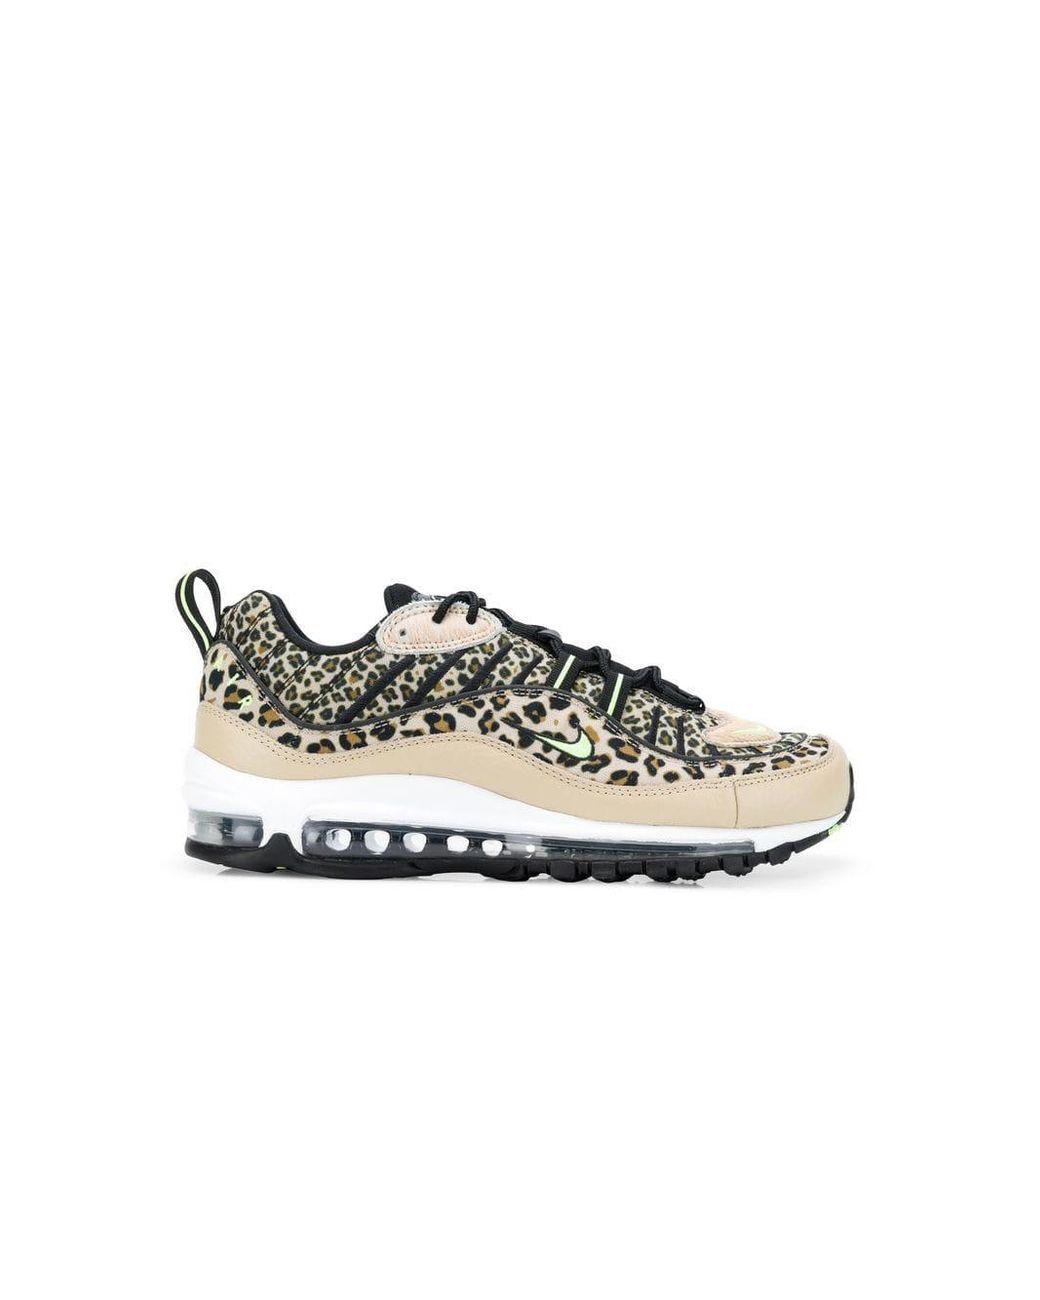 ed02780715ec Nike Air Max 98 Leopard Print Sneakers in Brown - Save 2% - Lyst